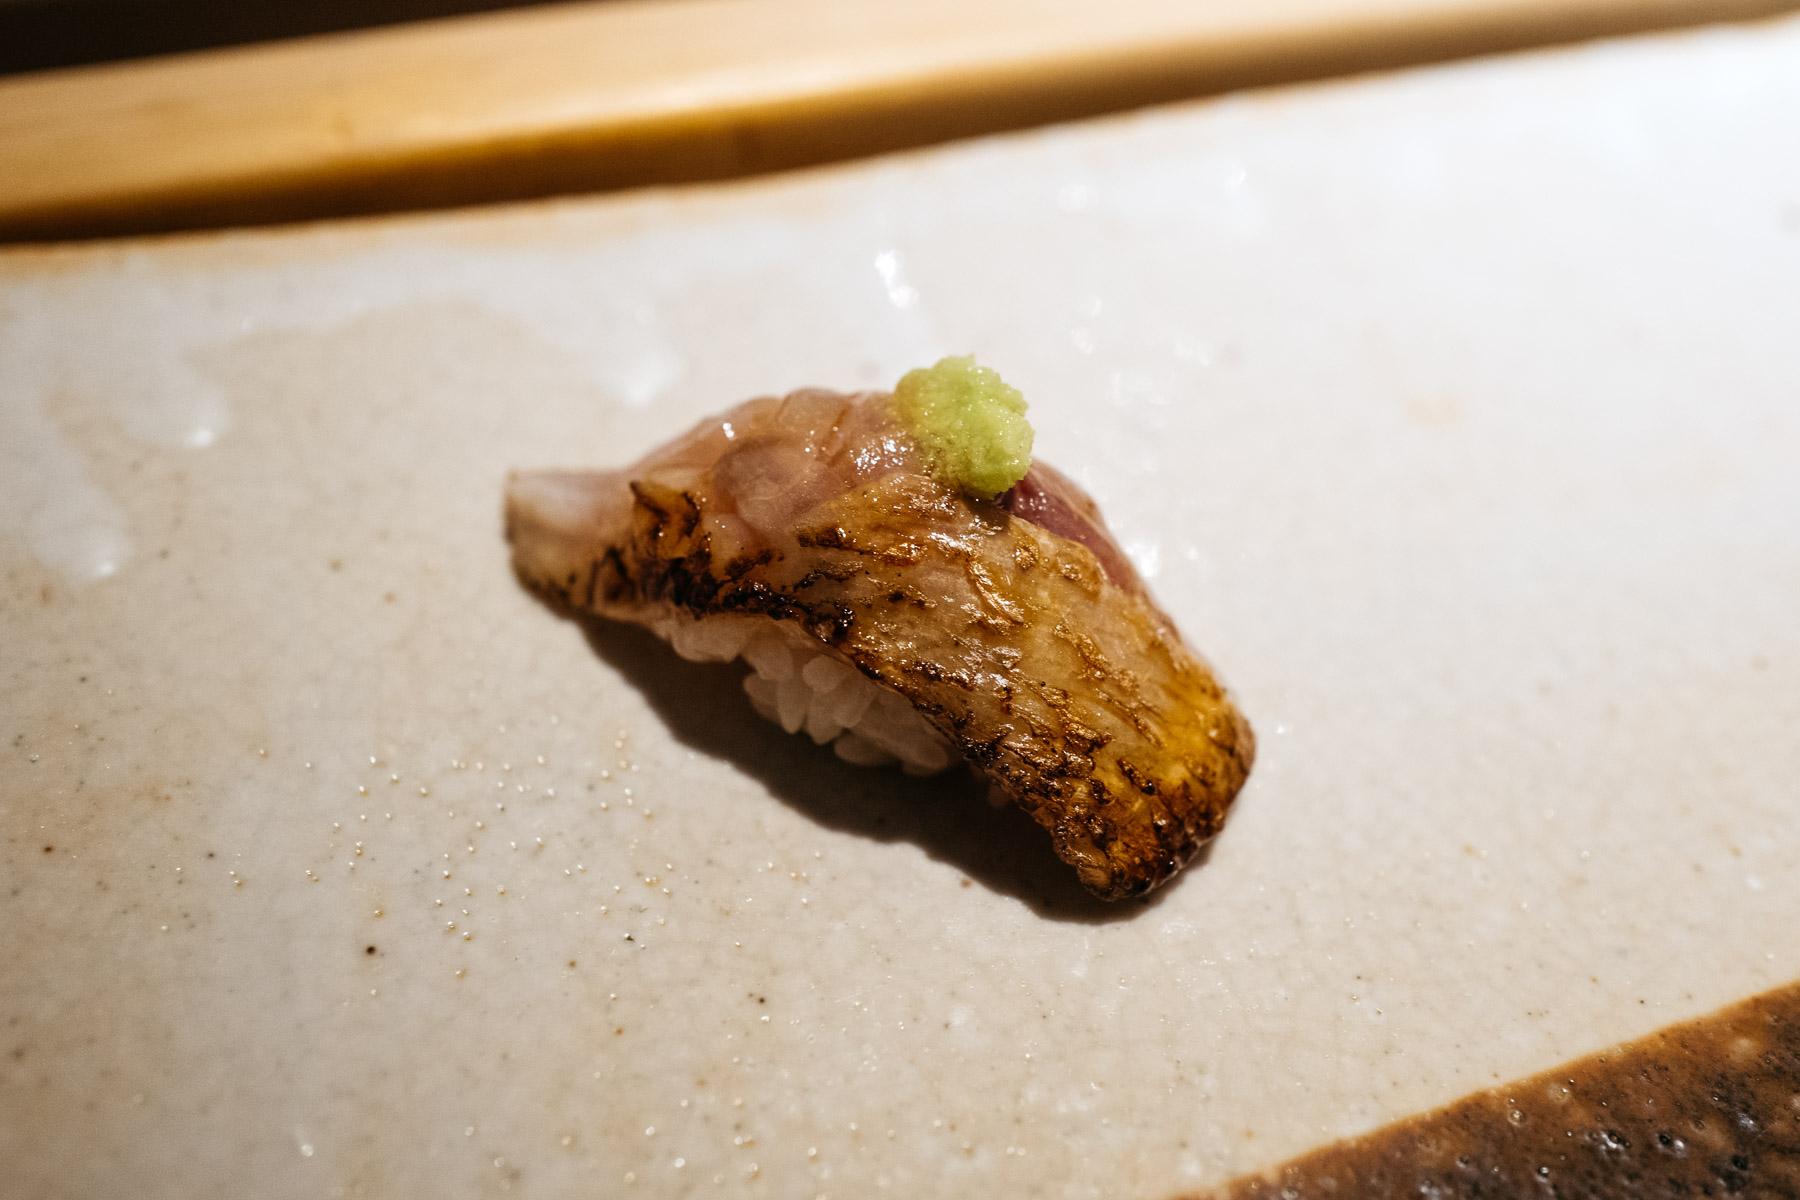 Nodoboro zuke (doederleinia berycoides)